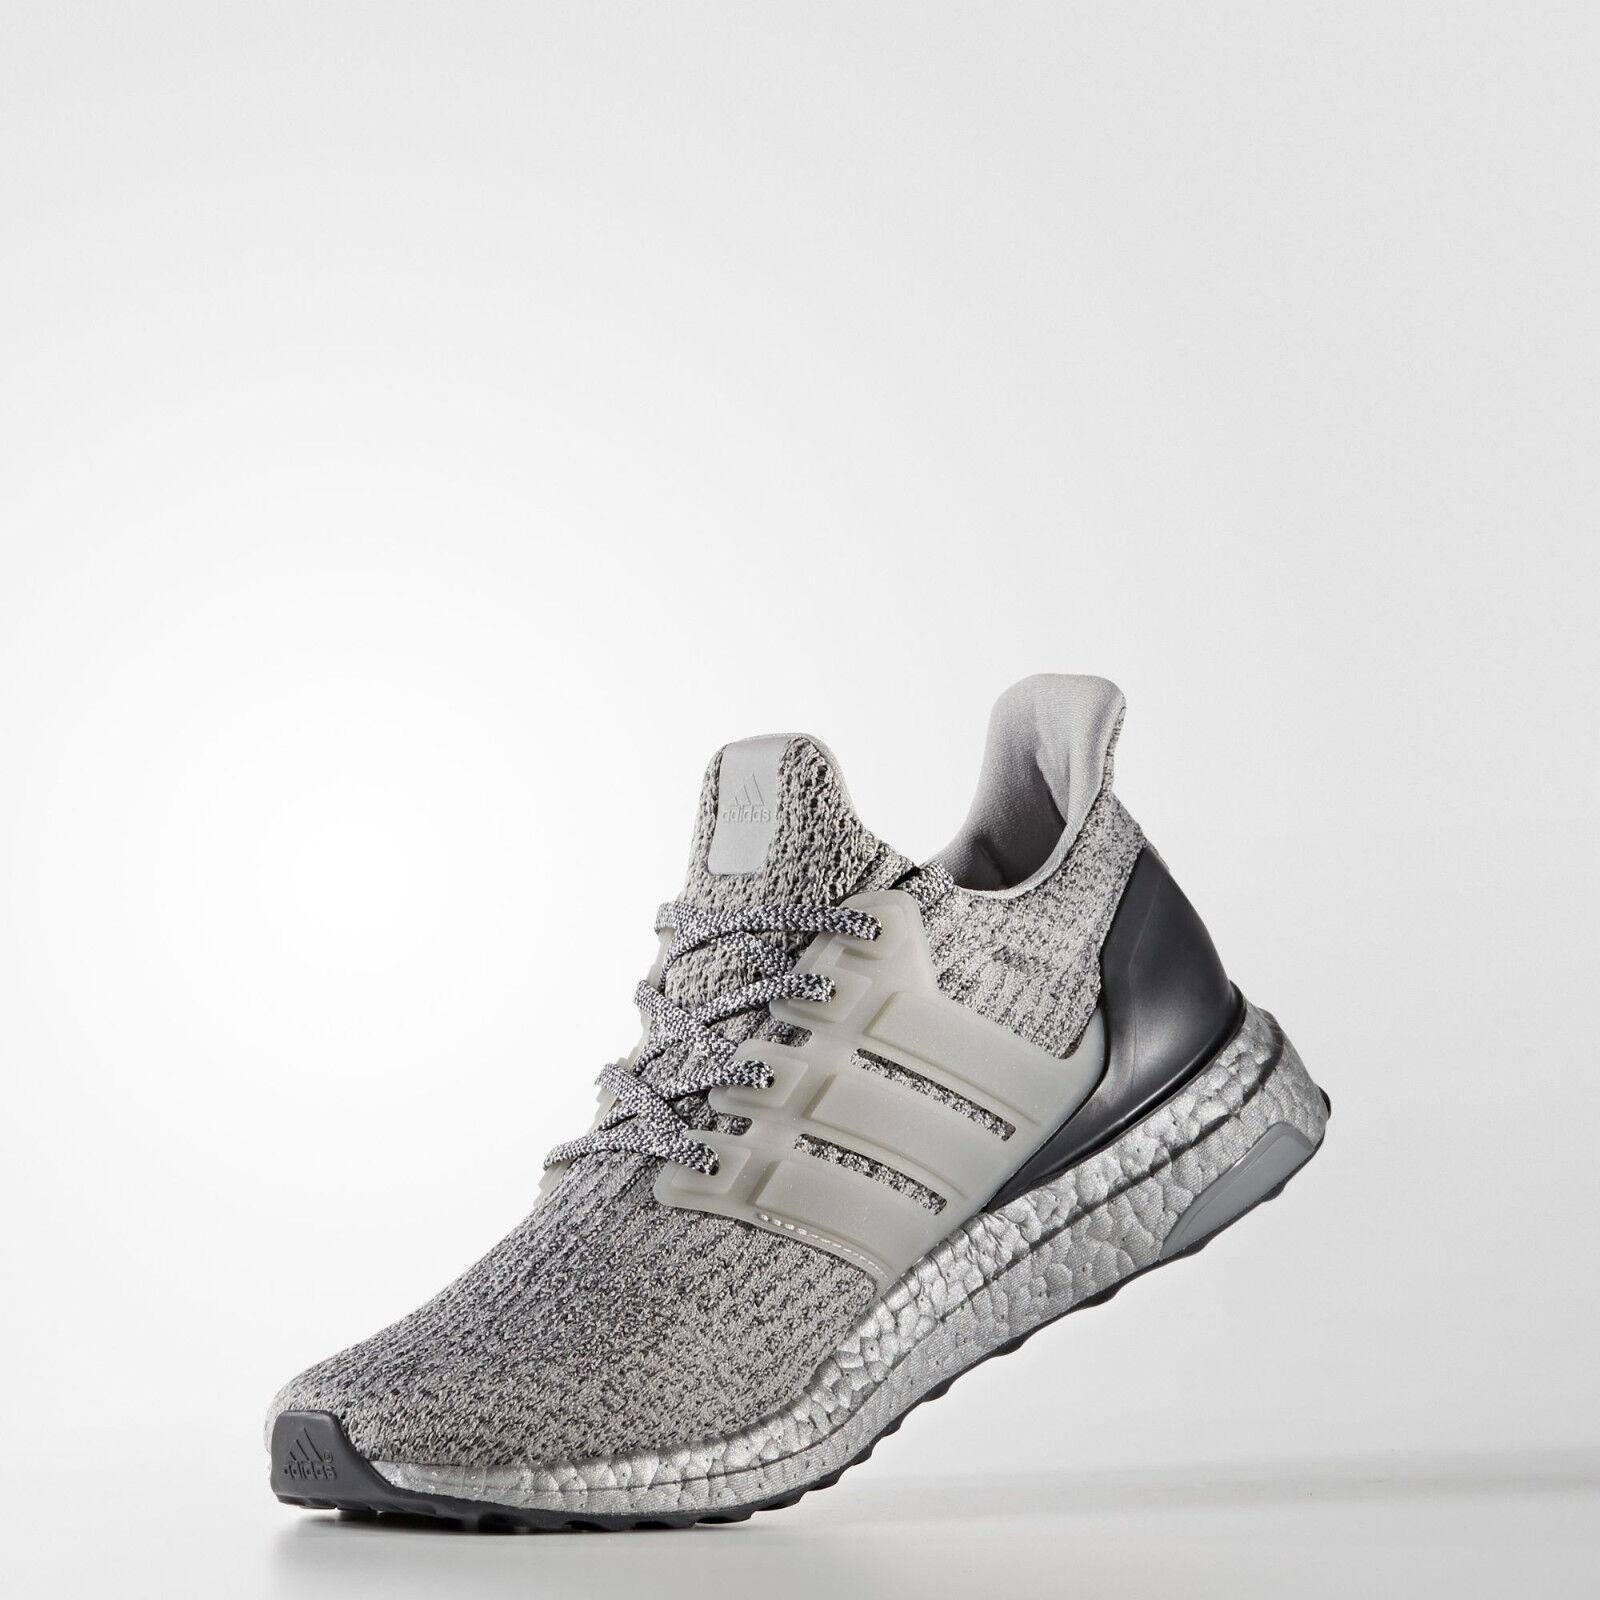 adidas Mens Running Ultra Boost Silver Super Bowl Running Mens Shoes BA8143 UltraBOOST befff0